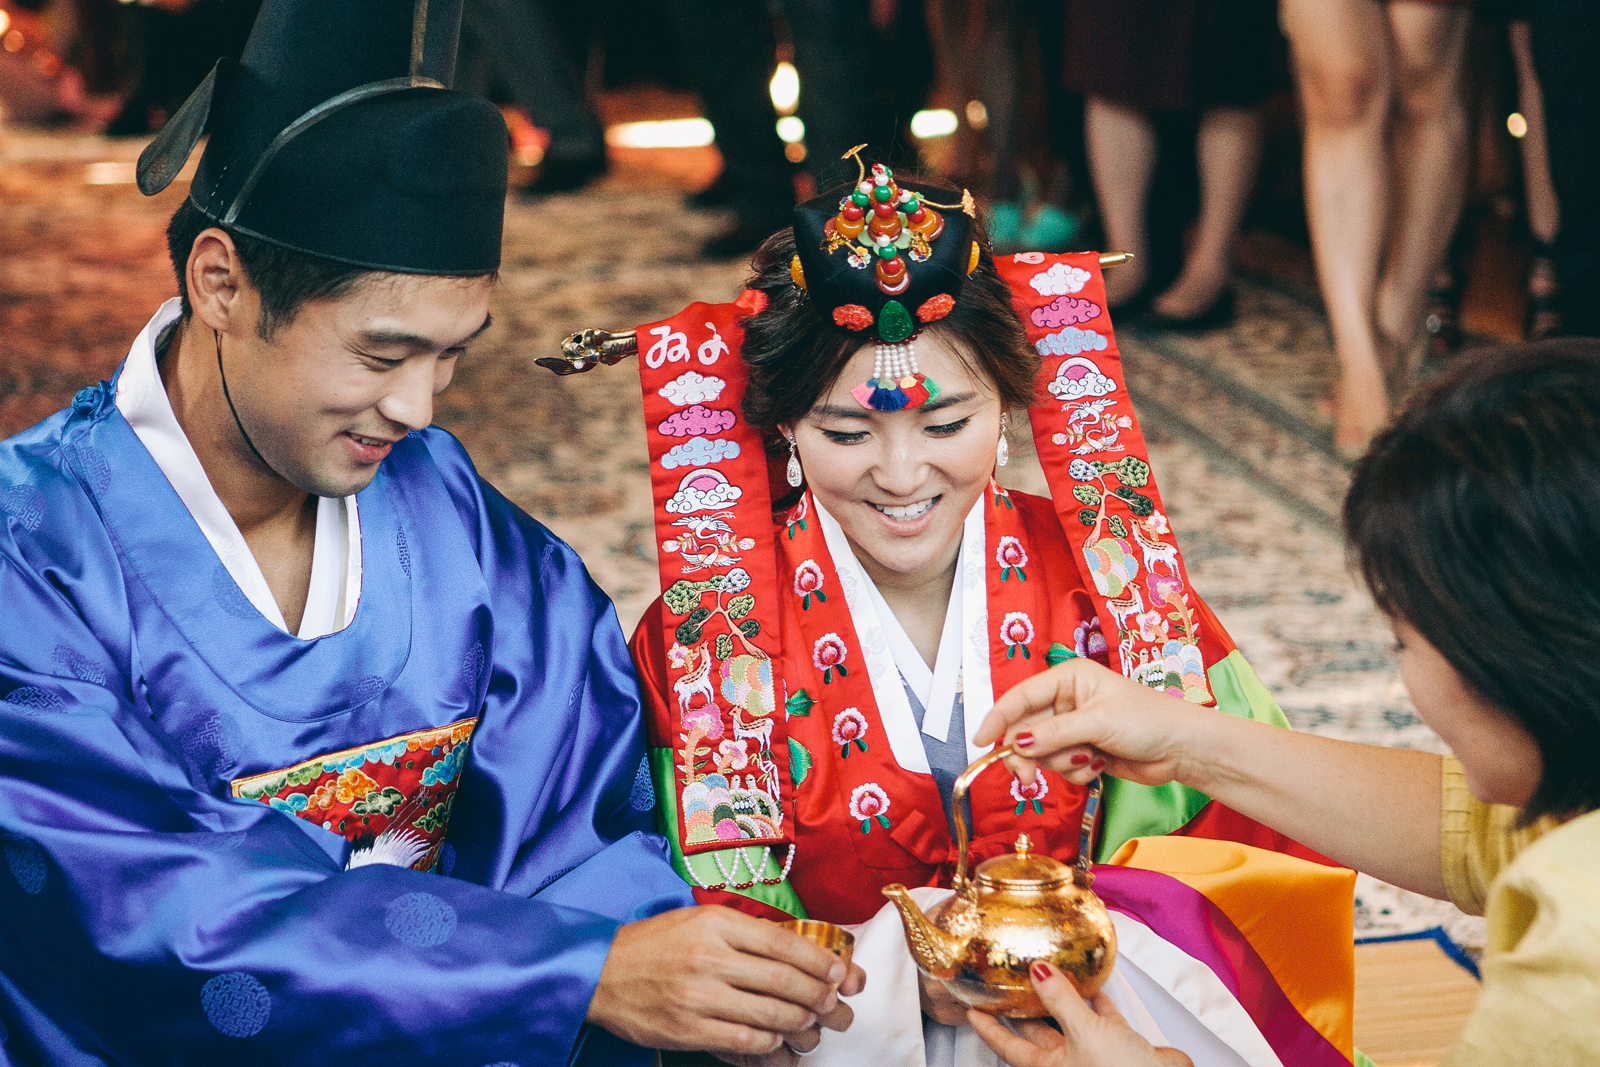 kohl_manison_wedding_photography_sarah_eric_ebony_siovhan_bokeh_photography_060.jpg